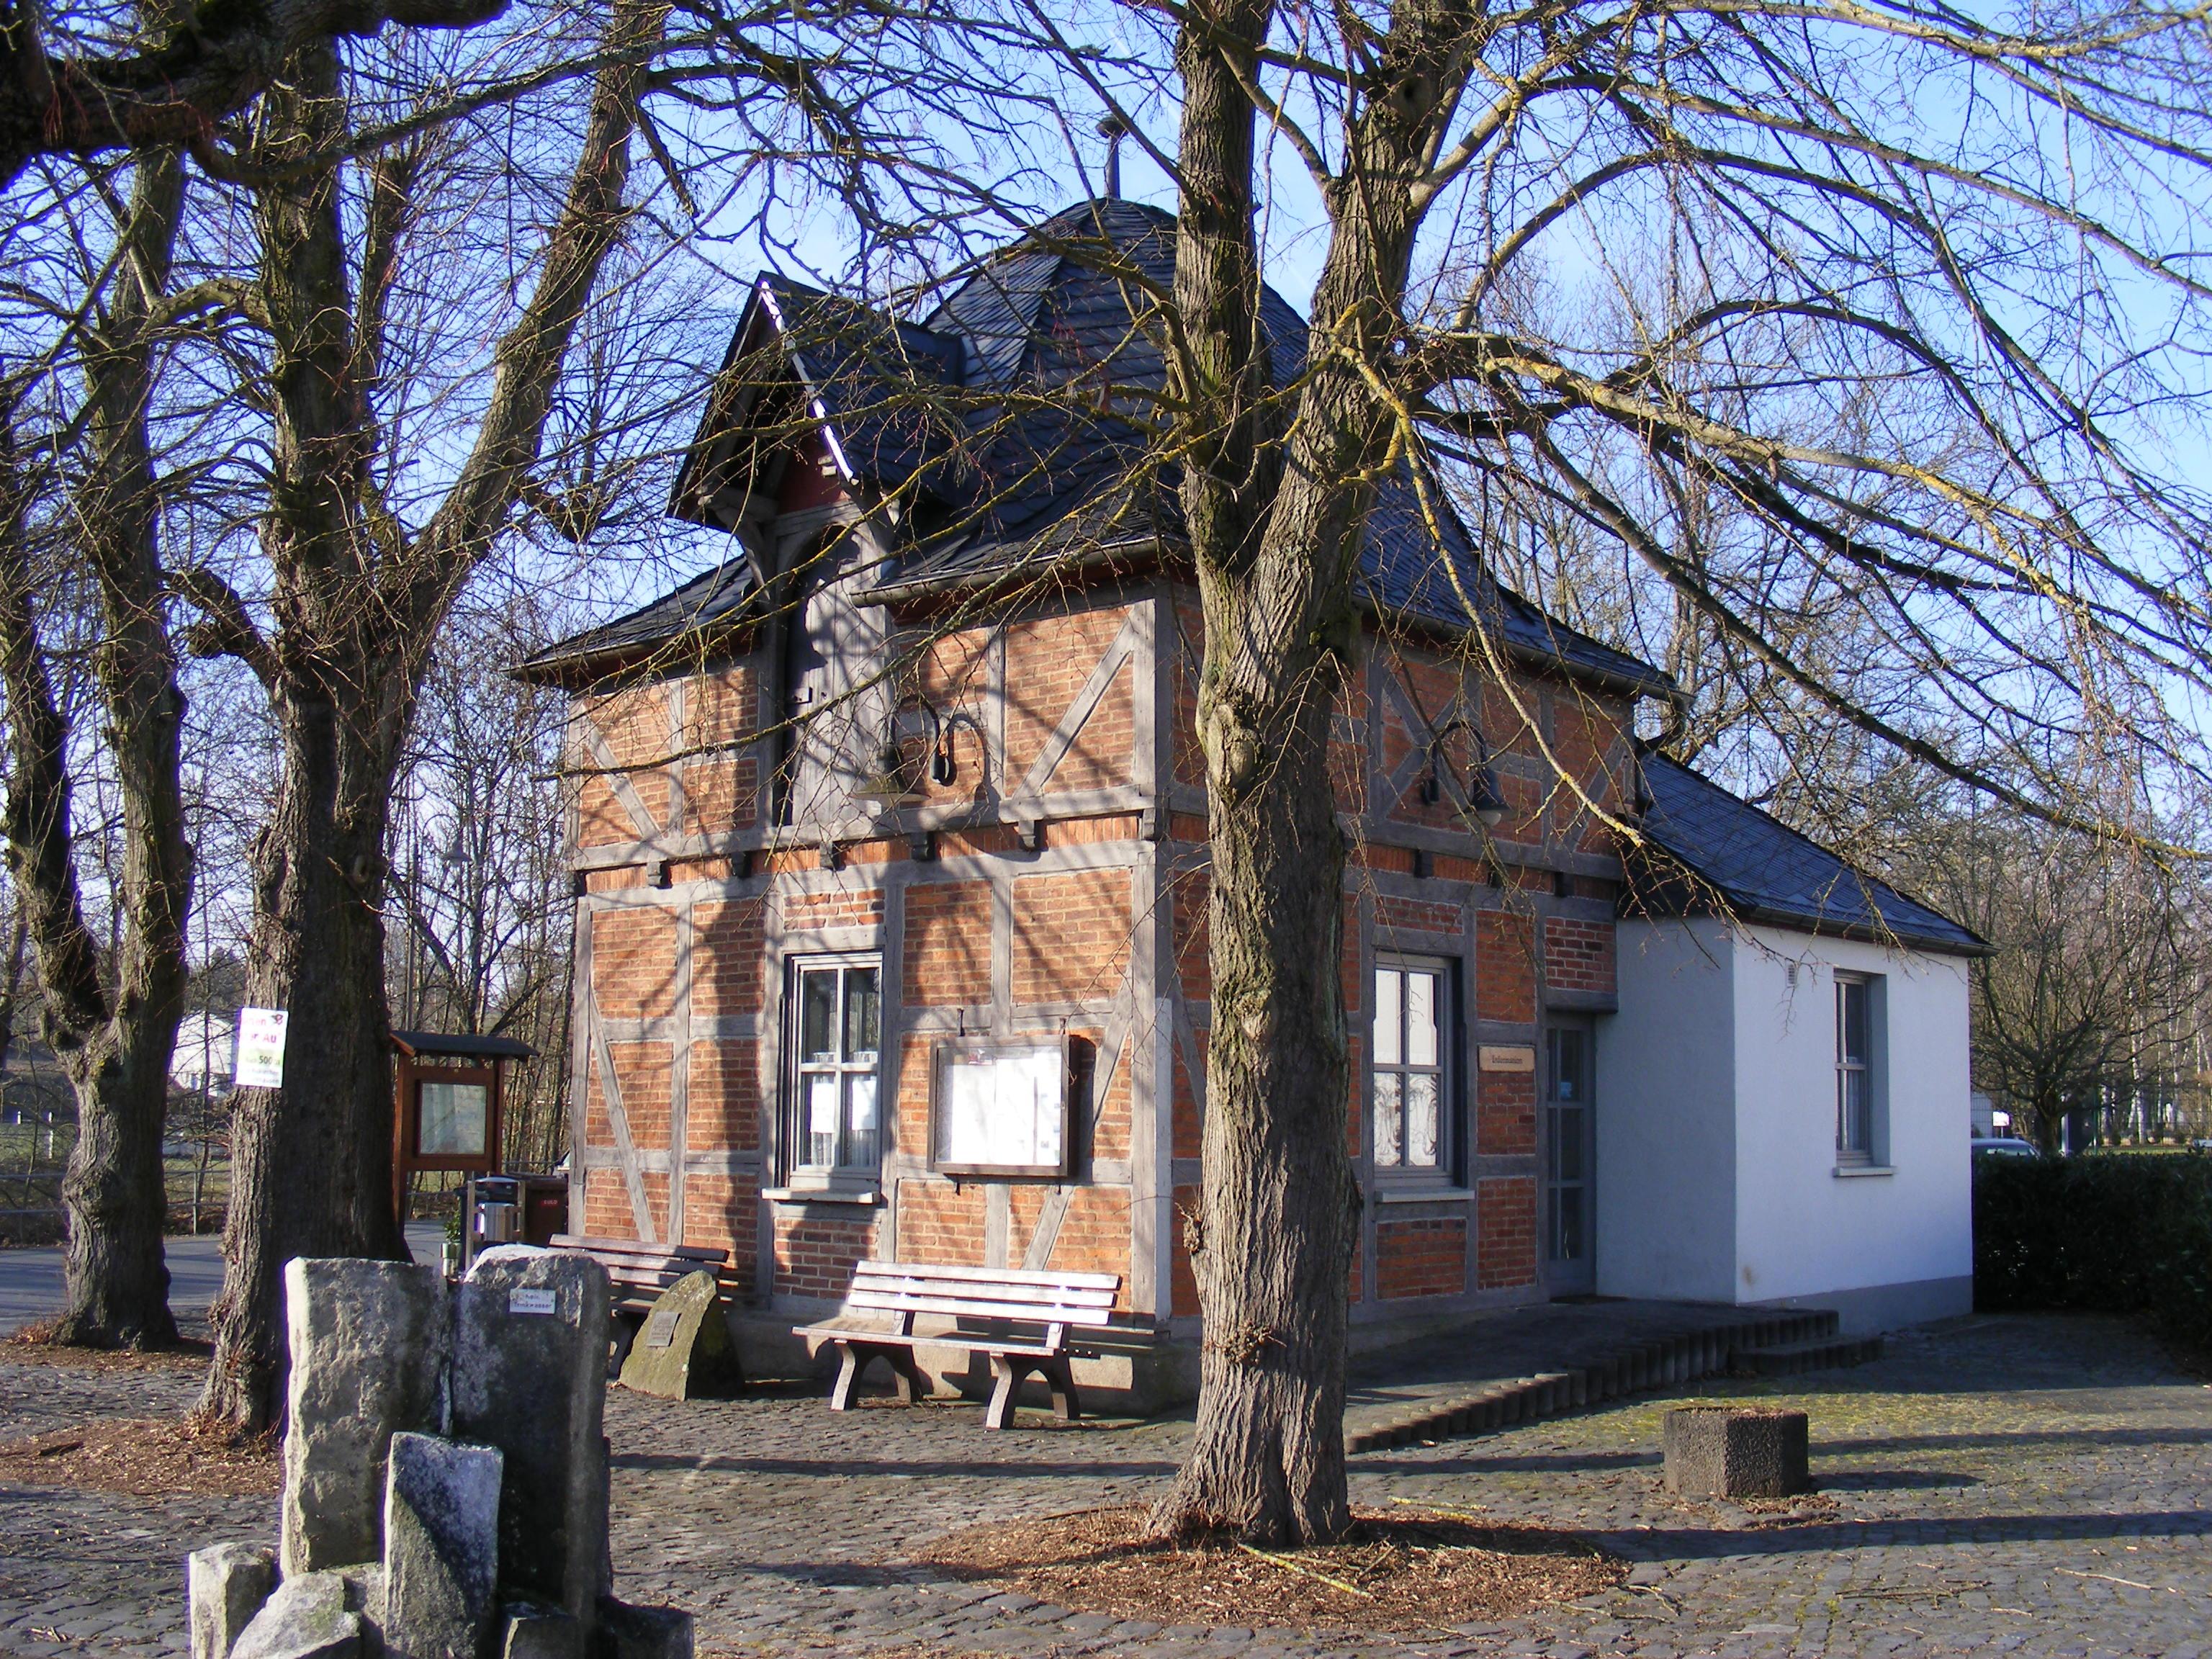 https://upload.wikimedia.org/wikipedia/commons/2/27/Biskirchen_Brunnenhaus_Seite.jpg